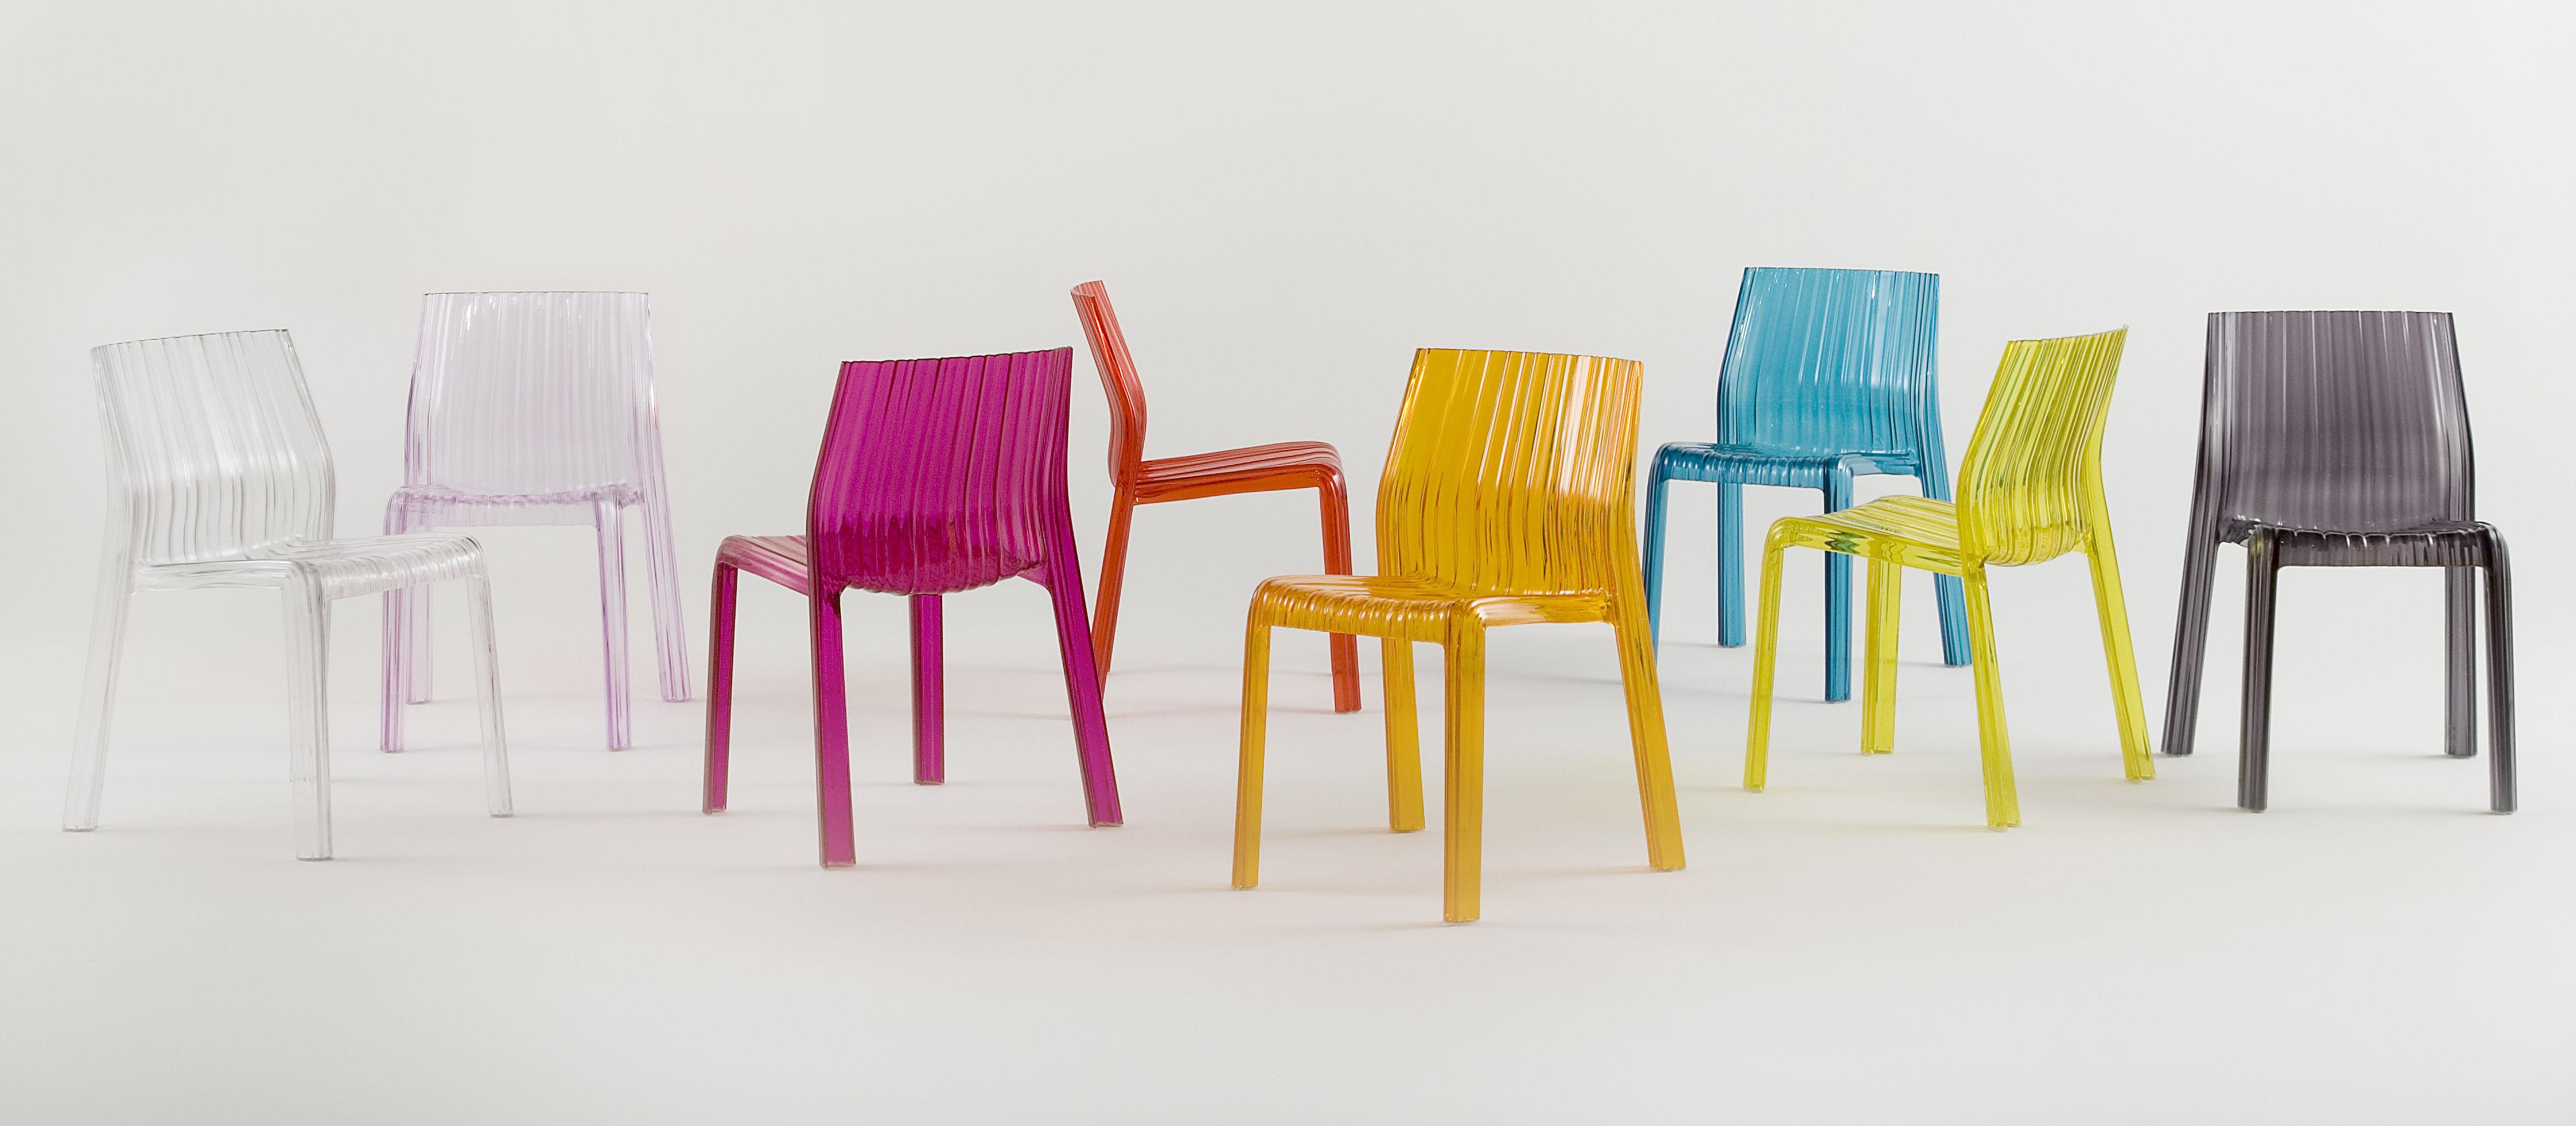 Scopri sedia frilly versione trasparente arancione trasparente di kartell made in design italia - Sedia trasparente kartell ...